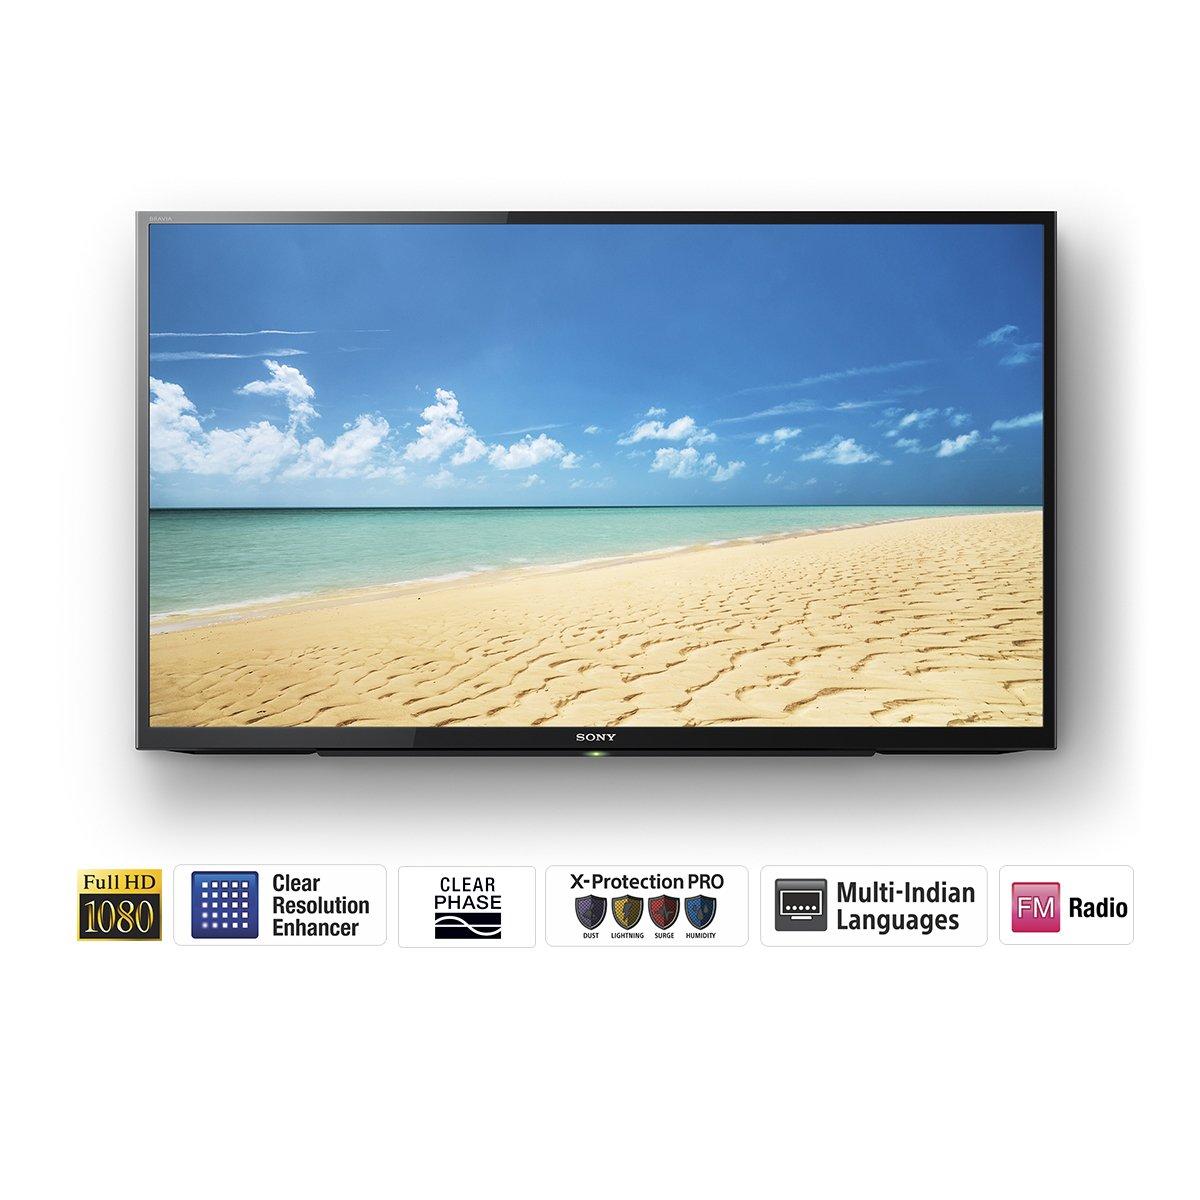 Top 10 40 inch LED TVs in India - Sony Bravia KLV-40R352D Full HD LED TV